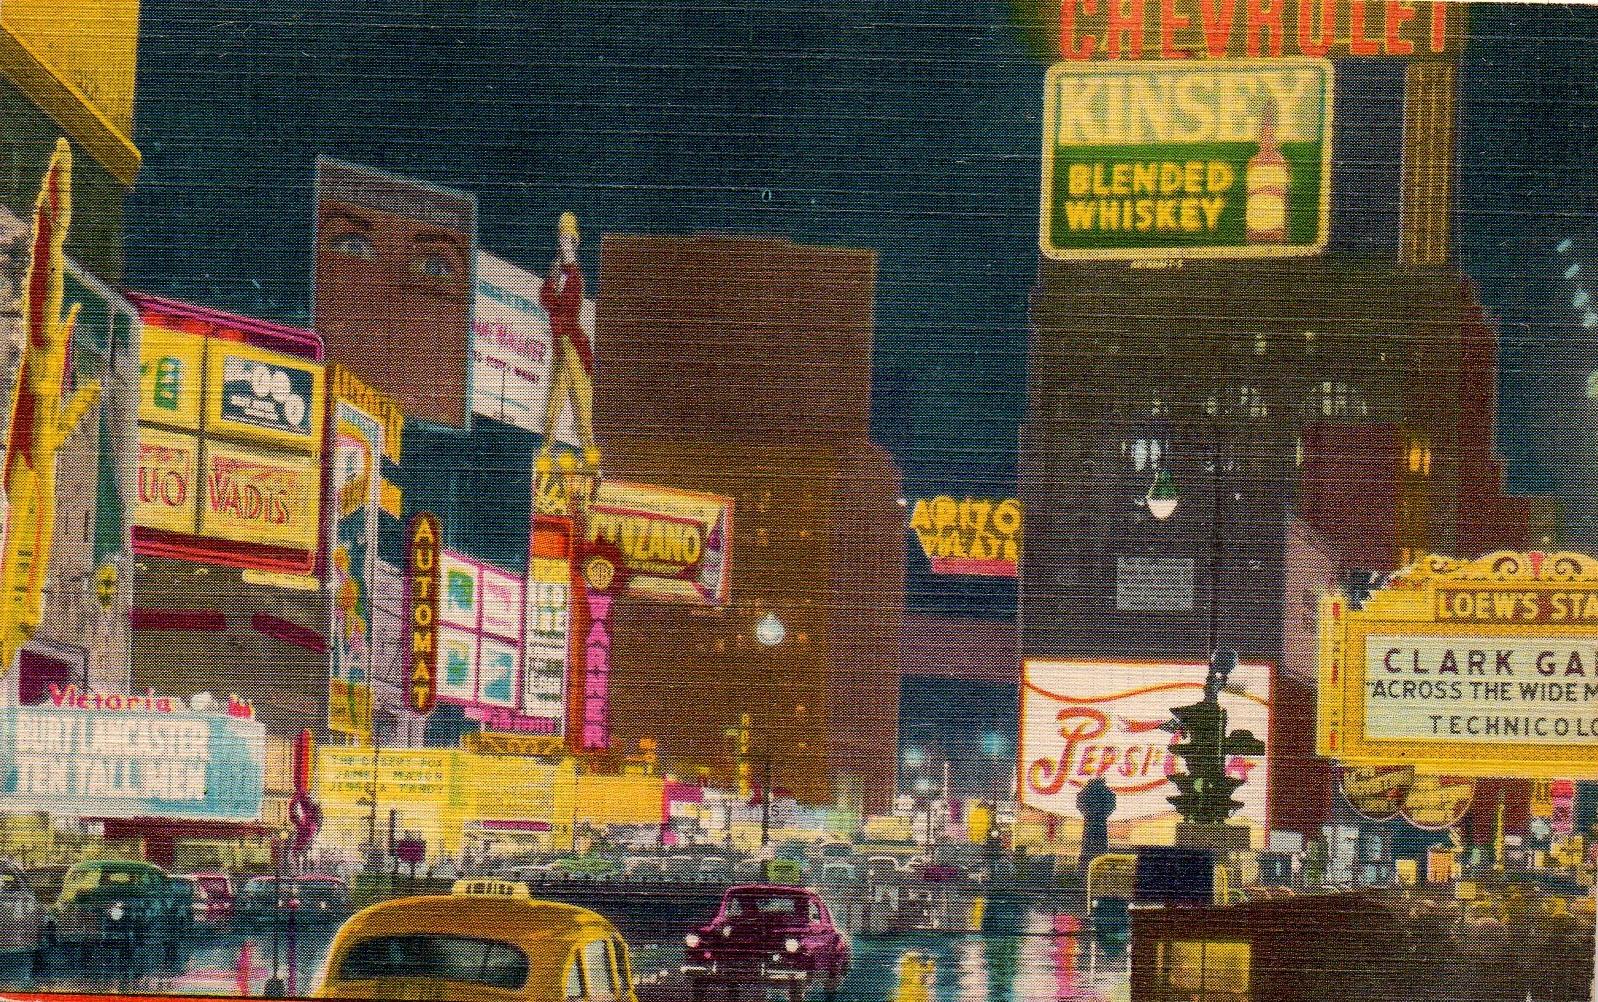 Times Square Ephemeral New York